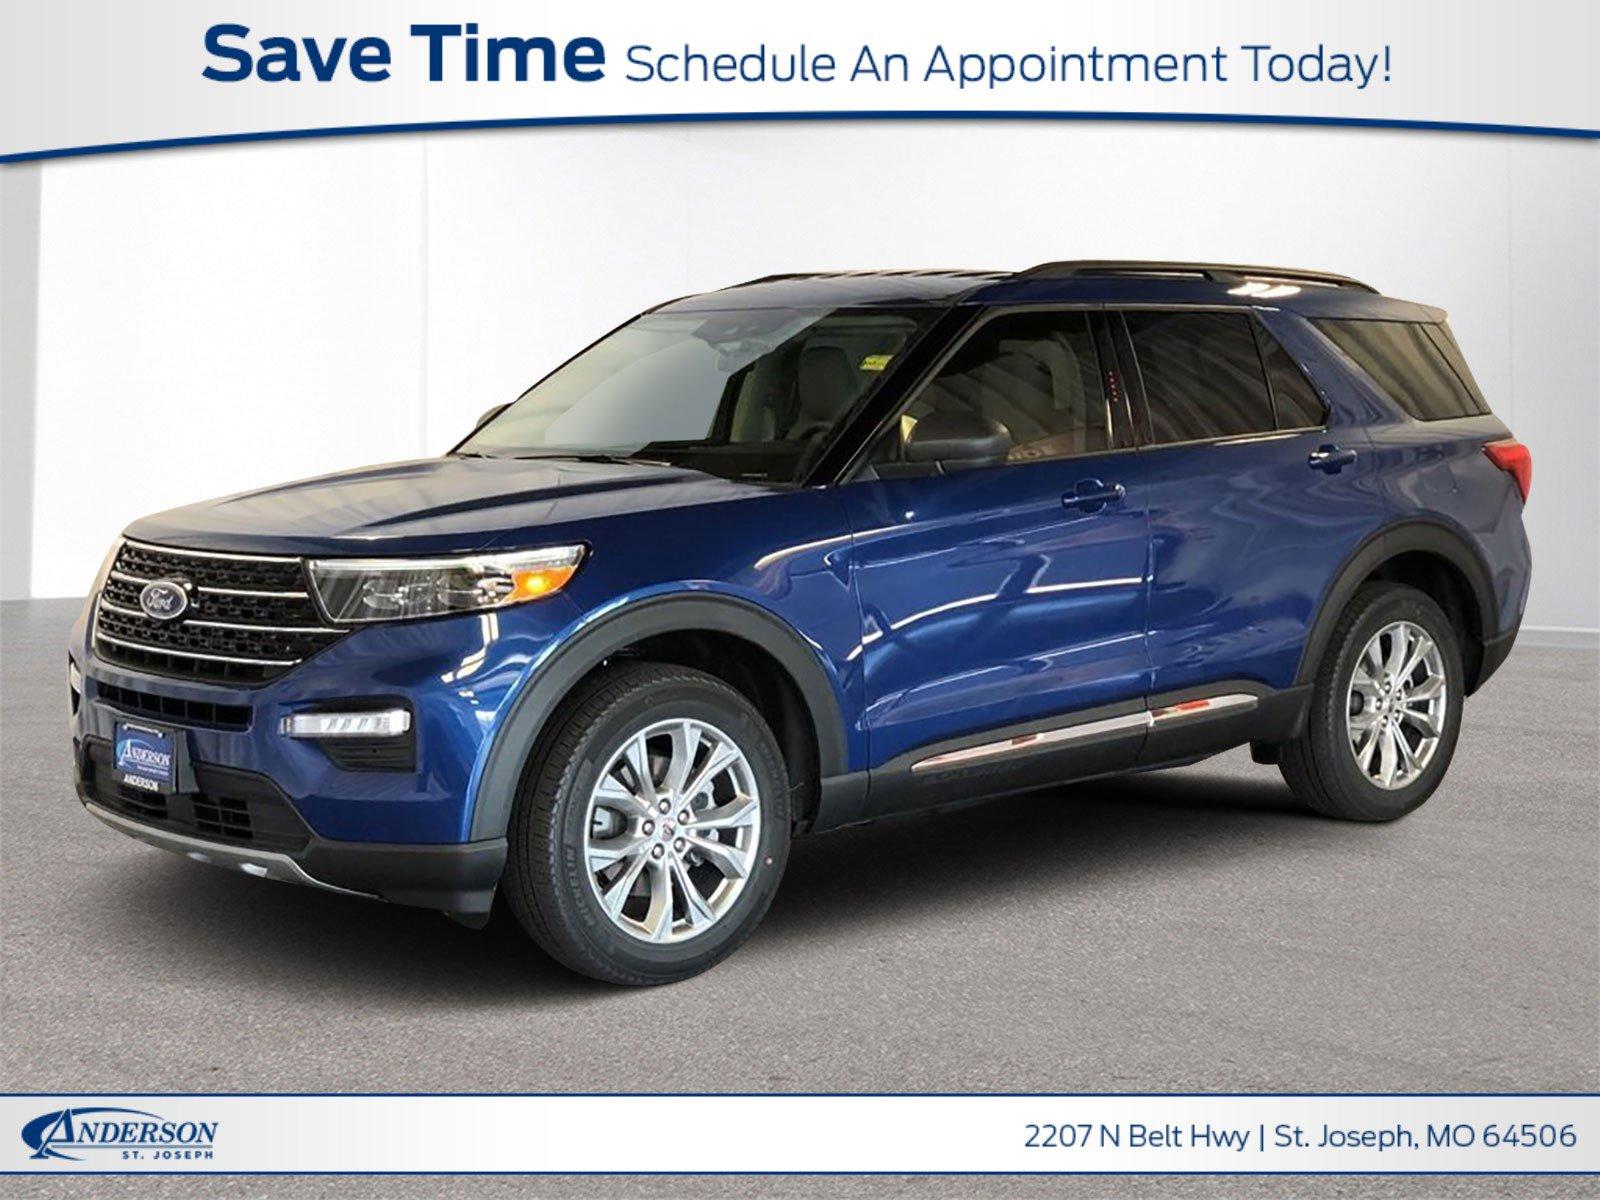 New 2020 Ford Explorer Xlt Sport Utility for sale in St Joseph MO